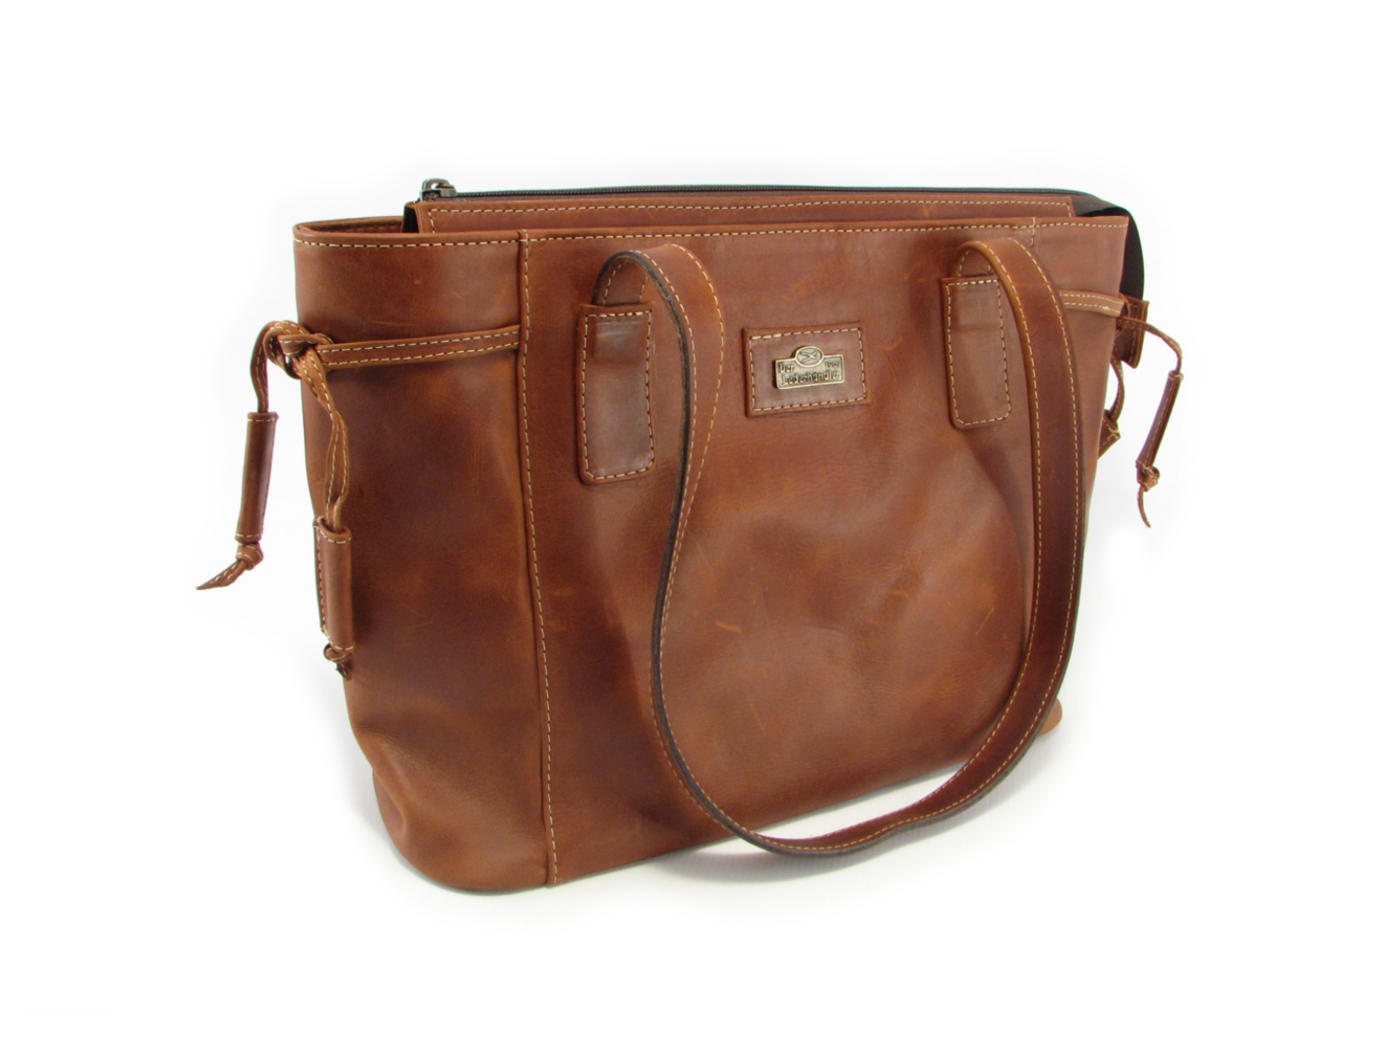 b94657146b Medium flat tote double strap handbag